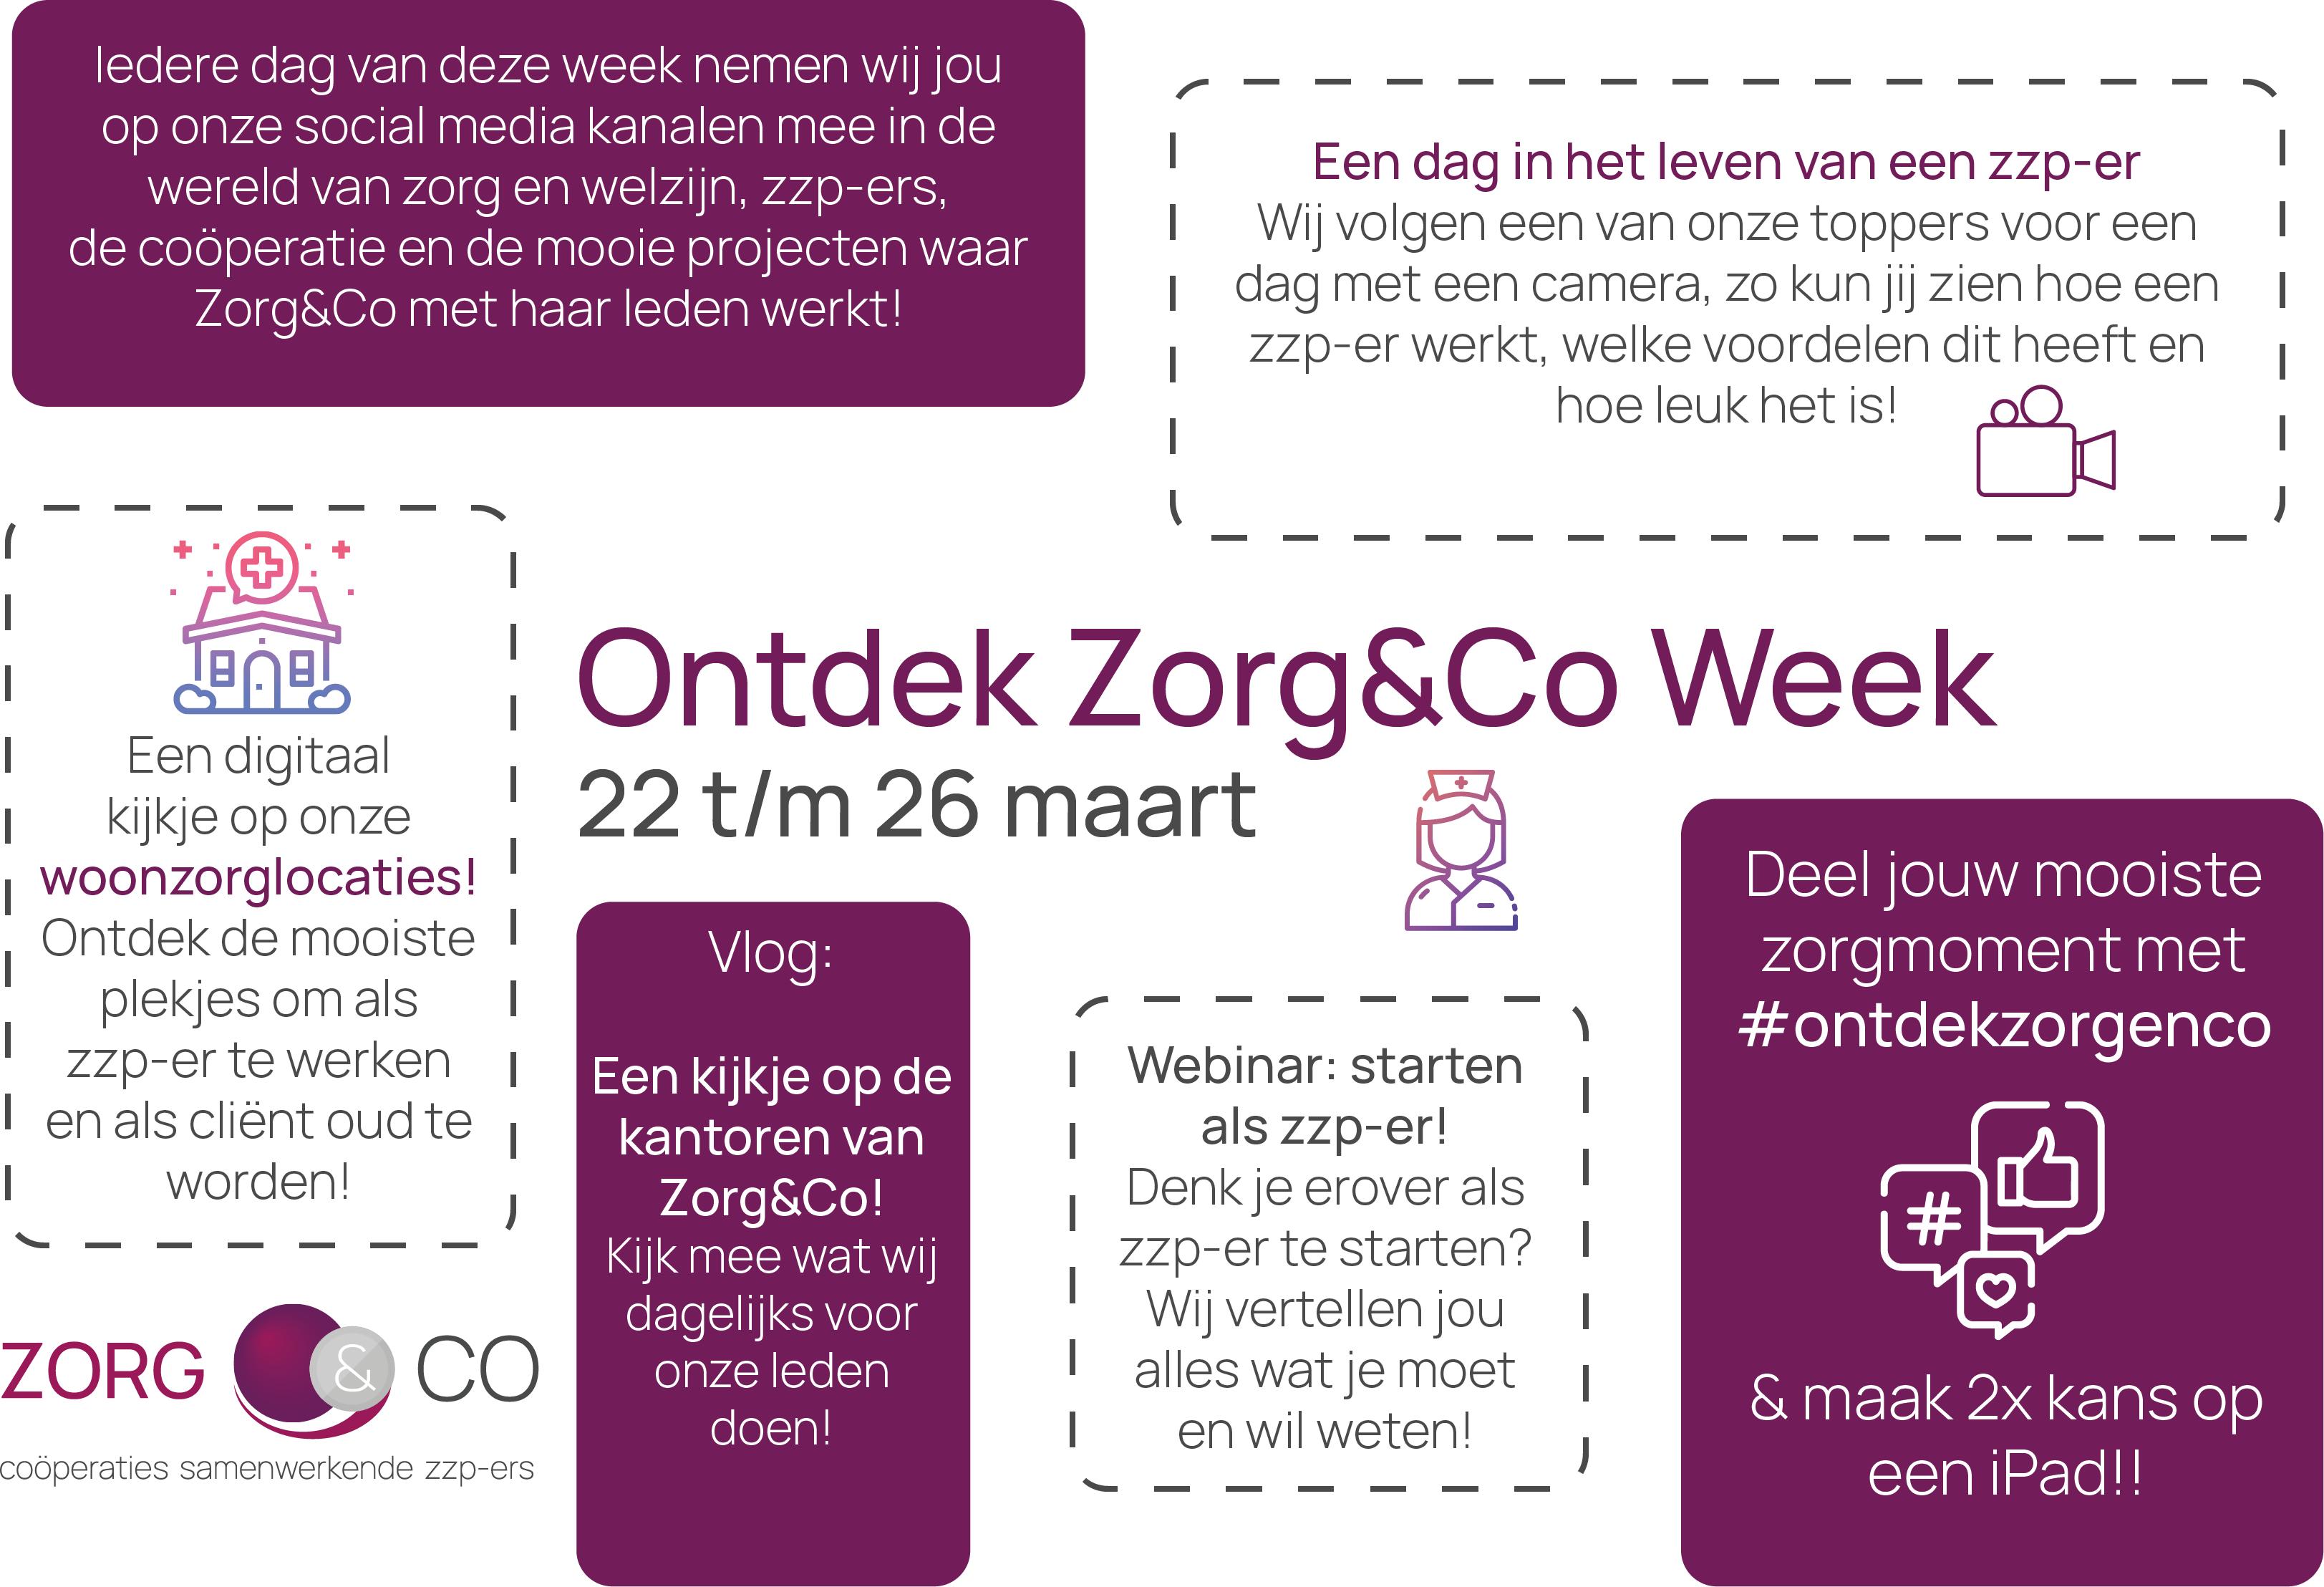 22 t/m 26 maart 2021: Ontdek Zorg&Co Week!